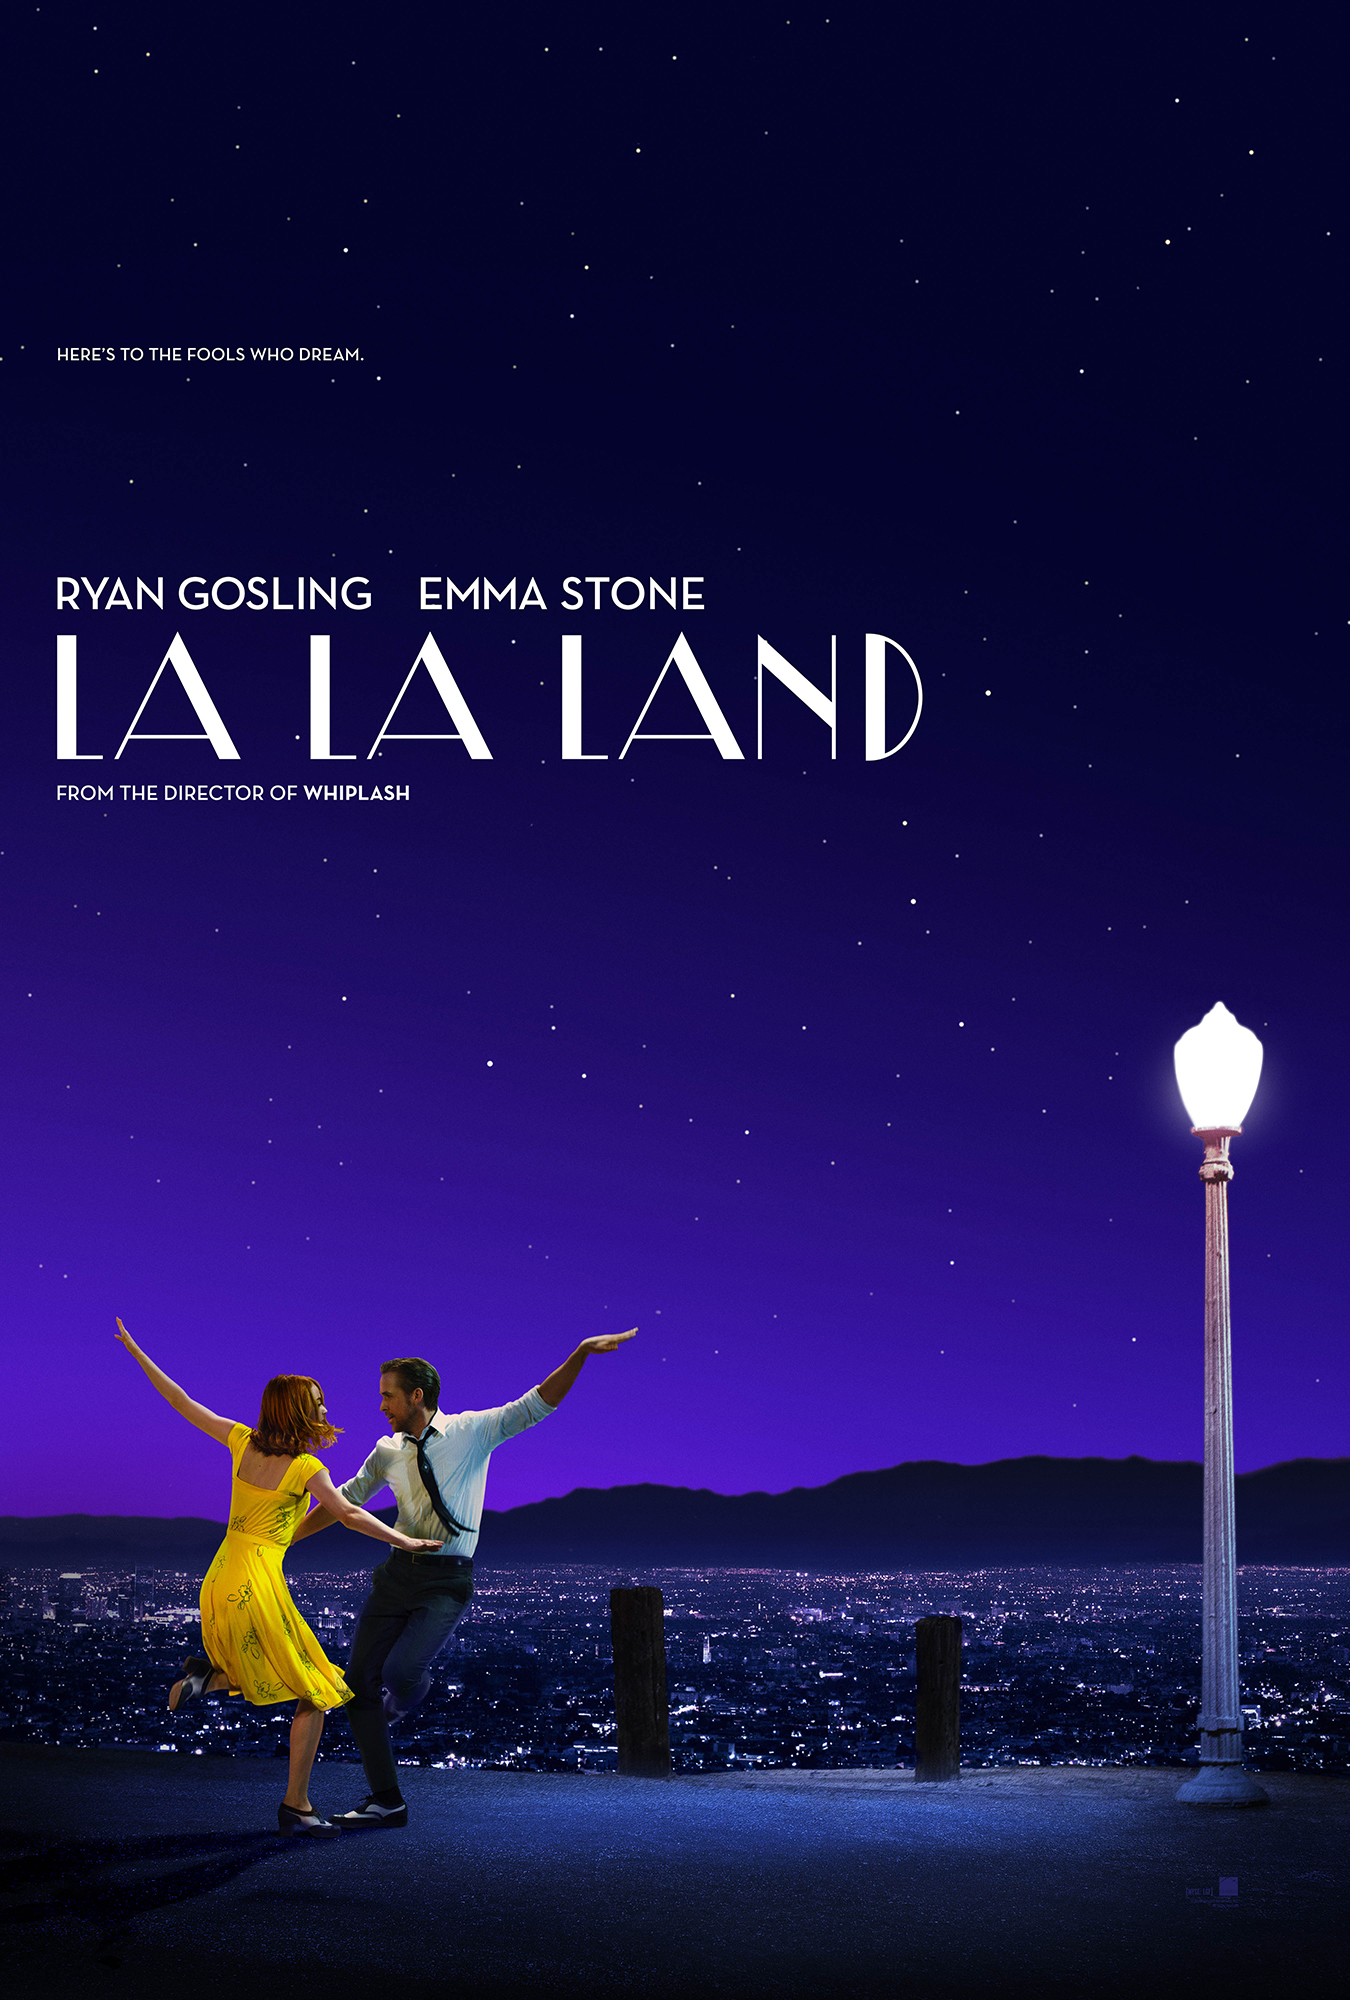 LaLaLand_1Sht_Skyline_OnlineCrop_100dpi.jpg